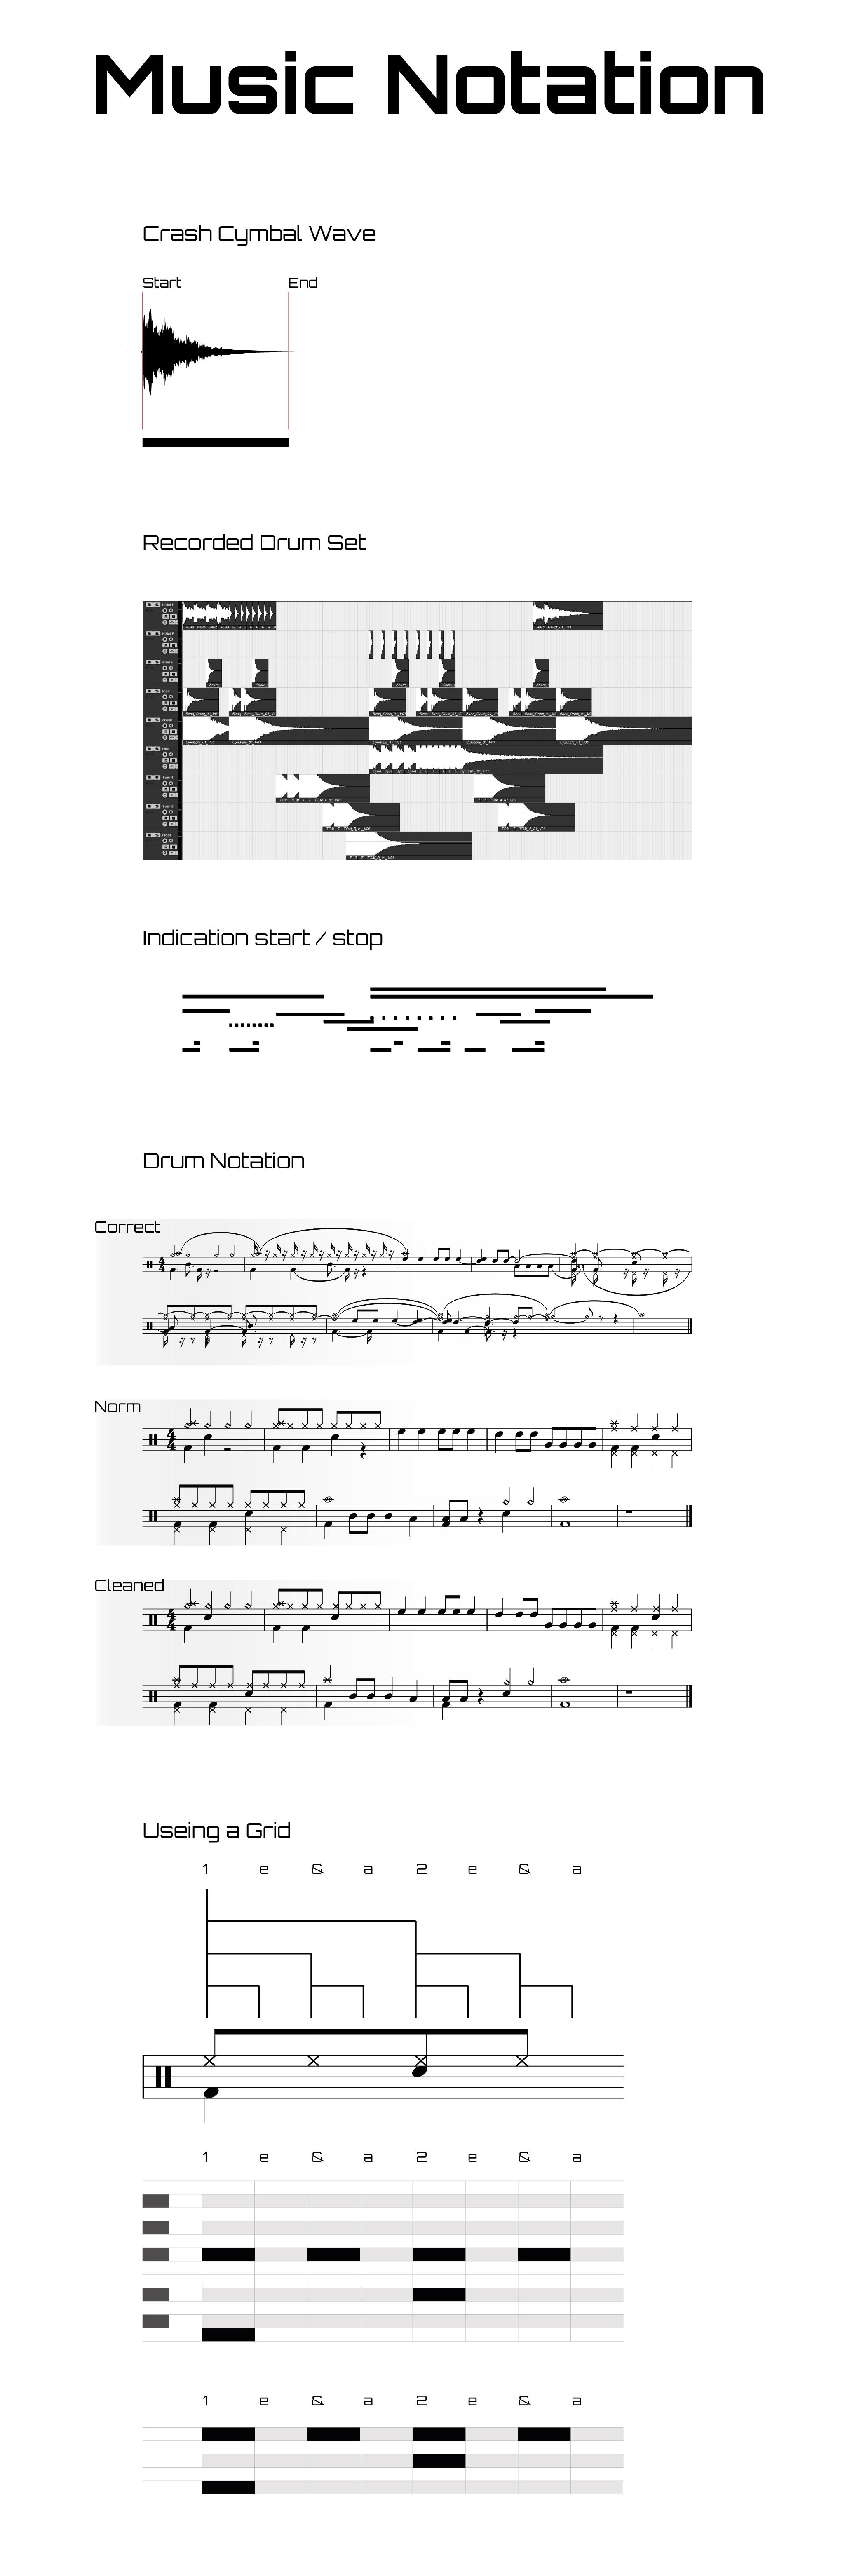 Notating Music - FutureTense